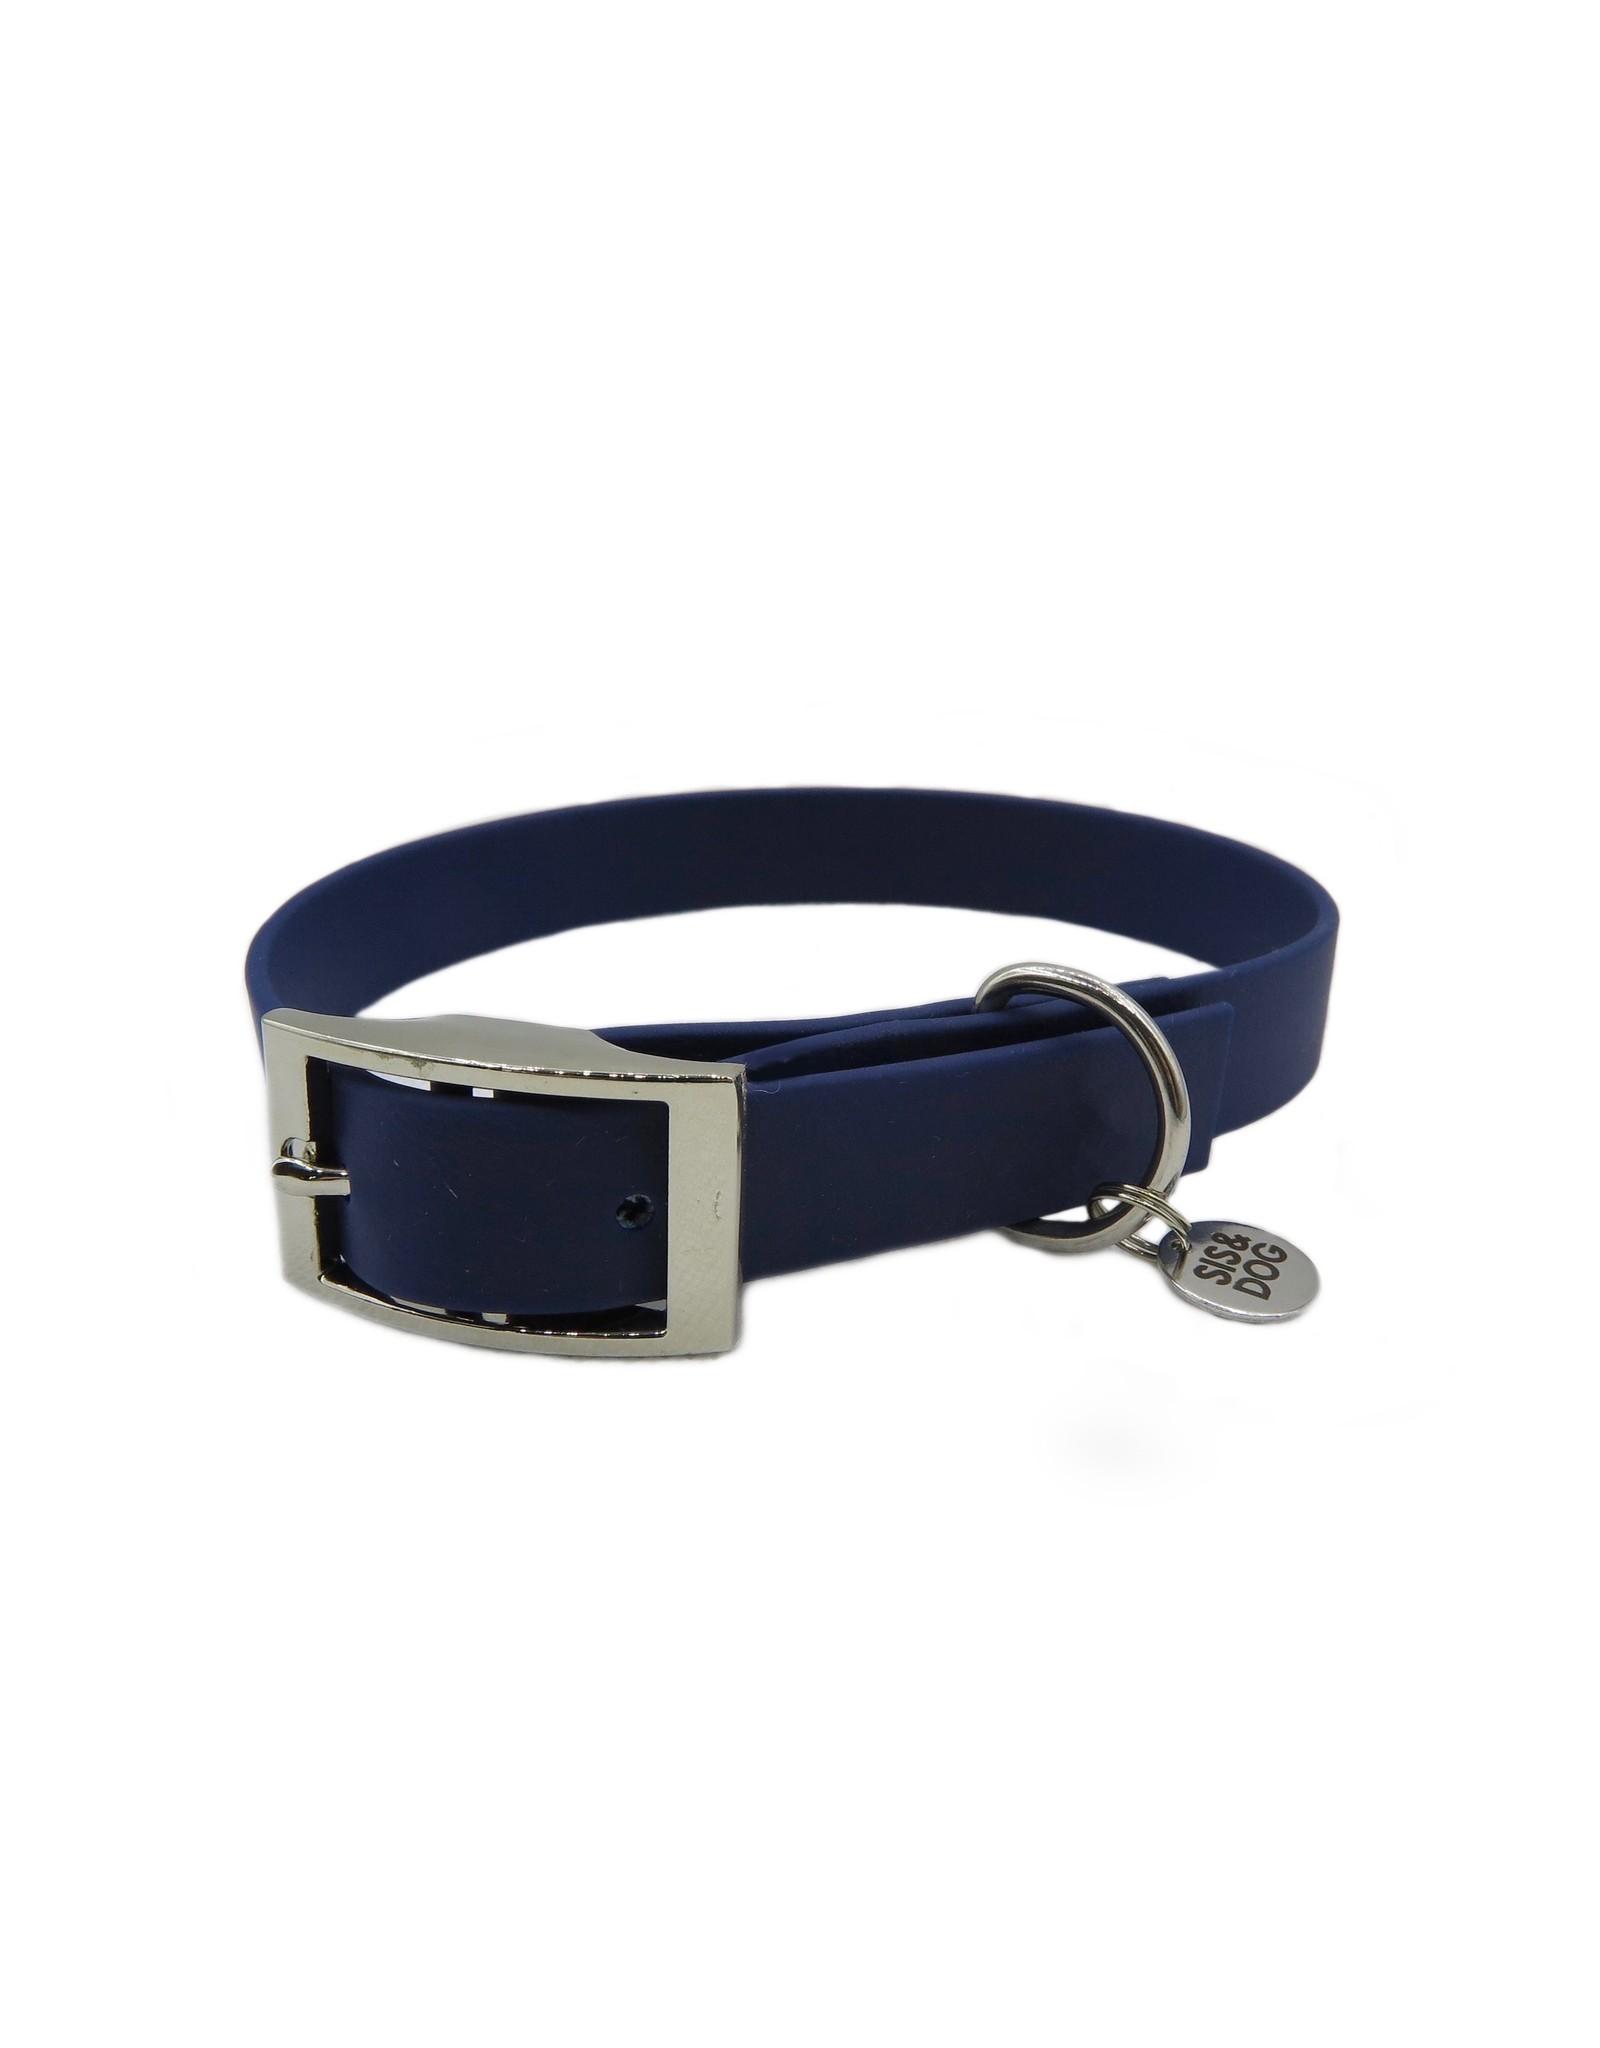 Collar dark blue